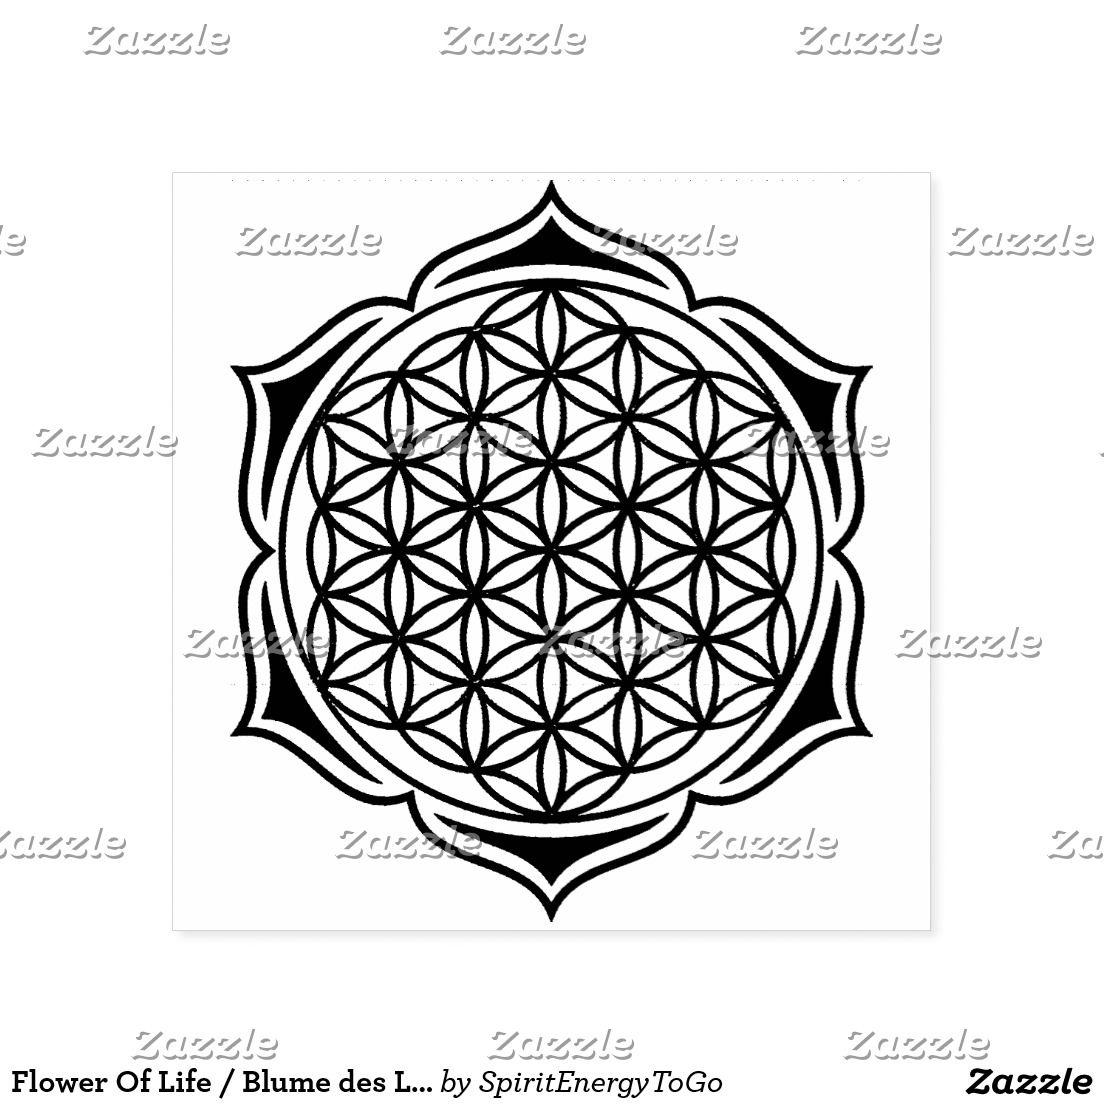 Flower Of Life / Blume des Lebens - Lotus II